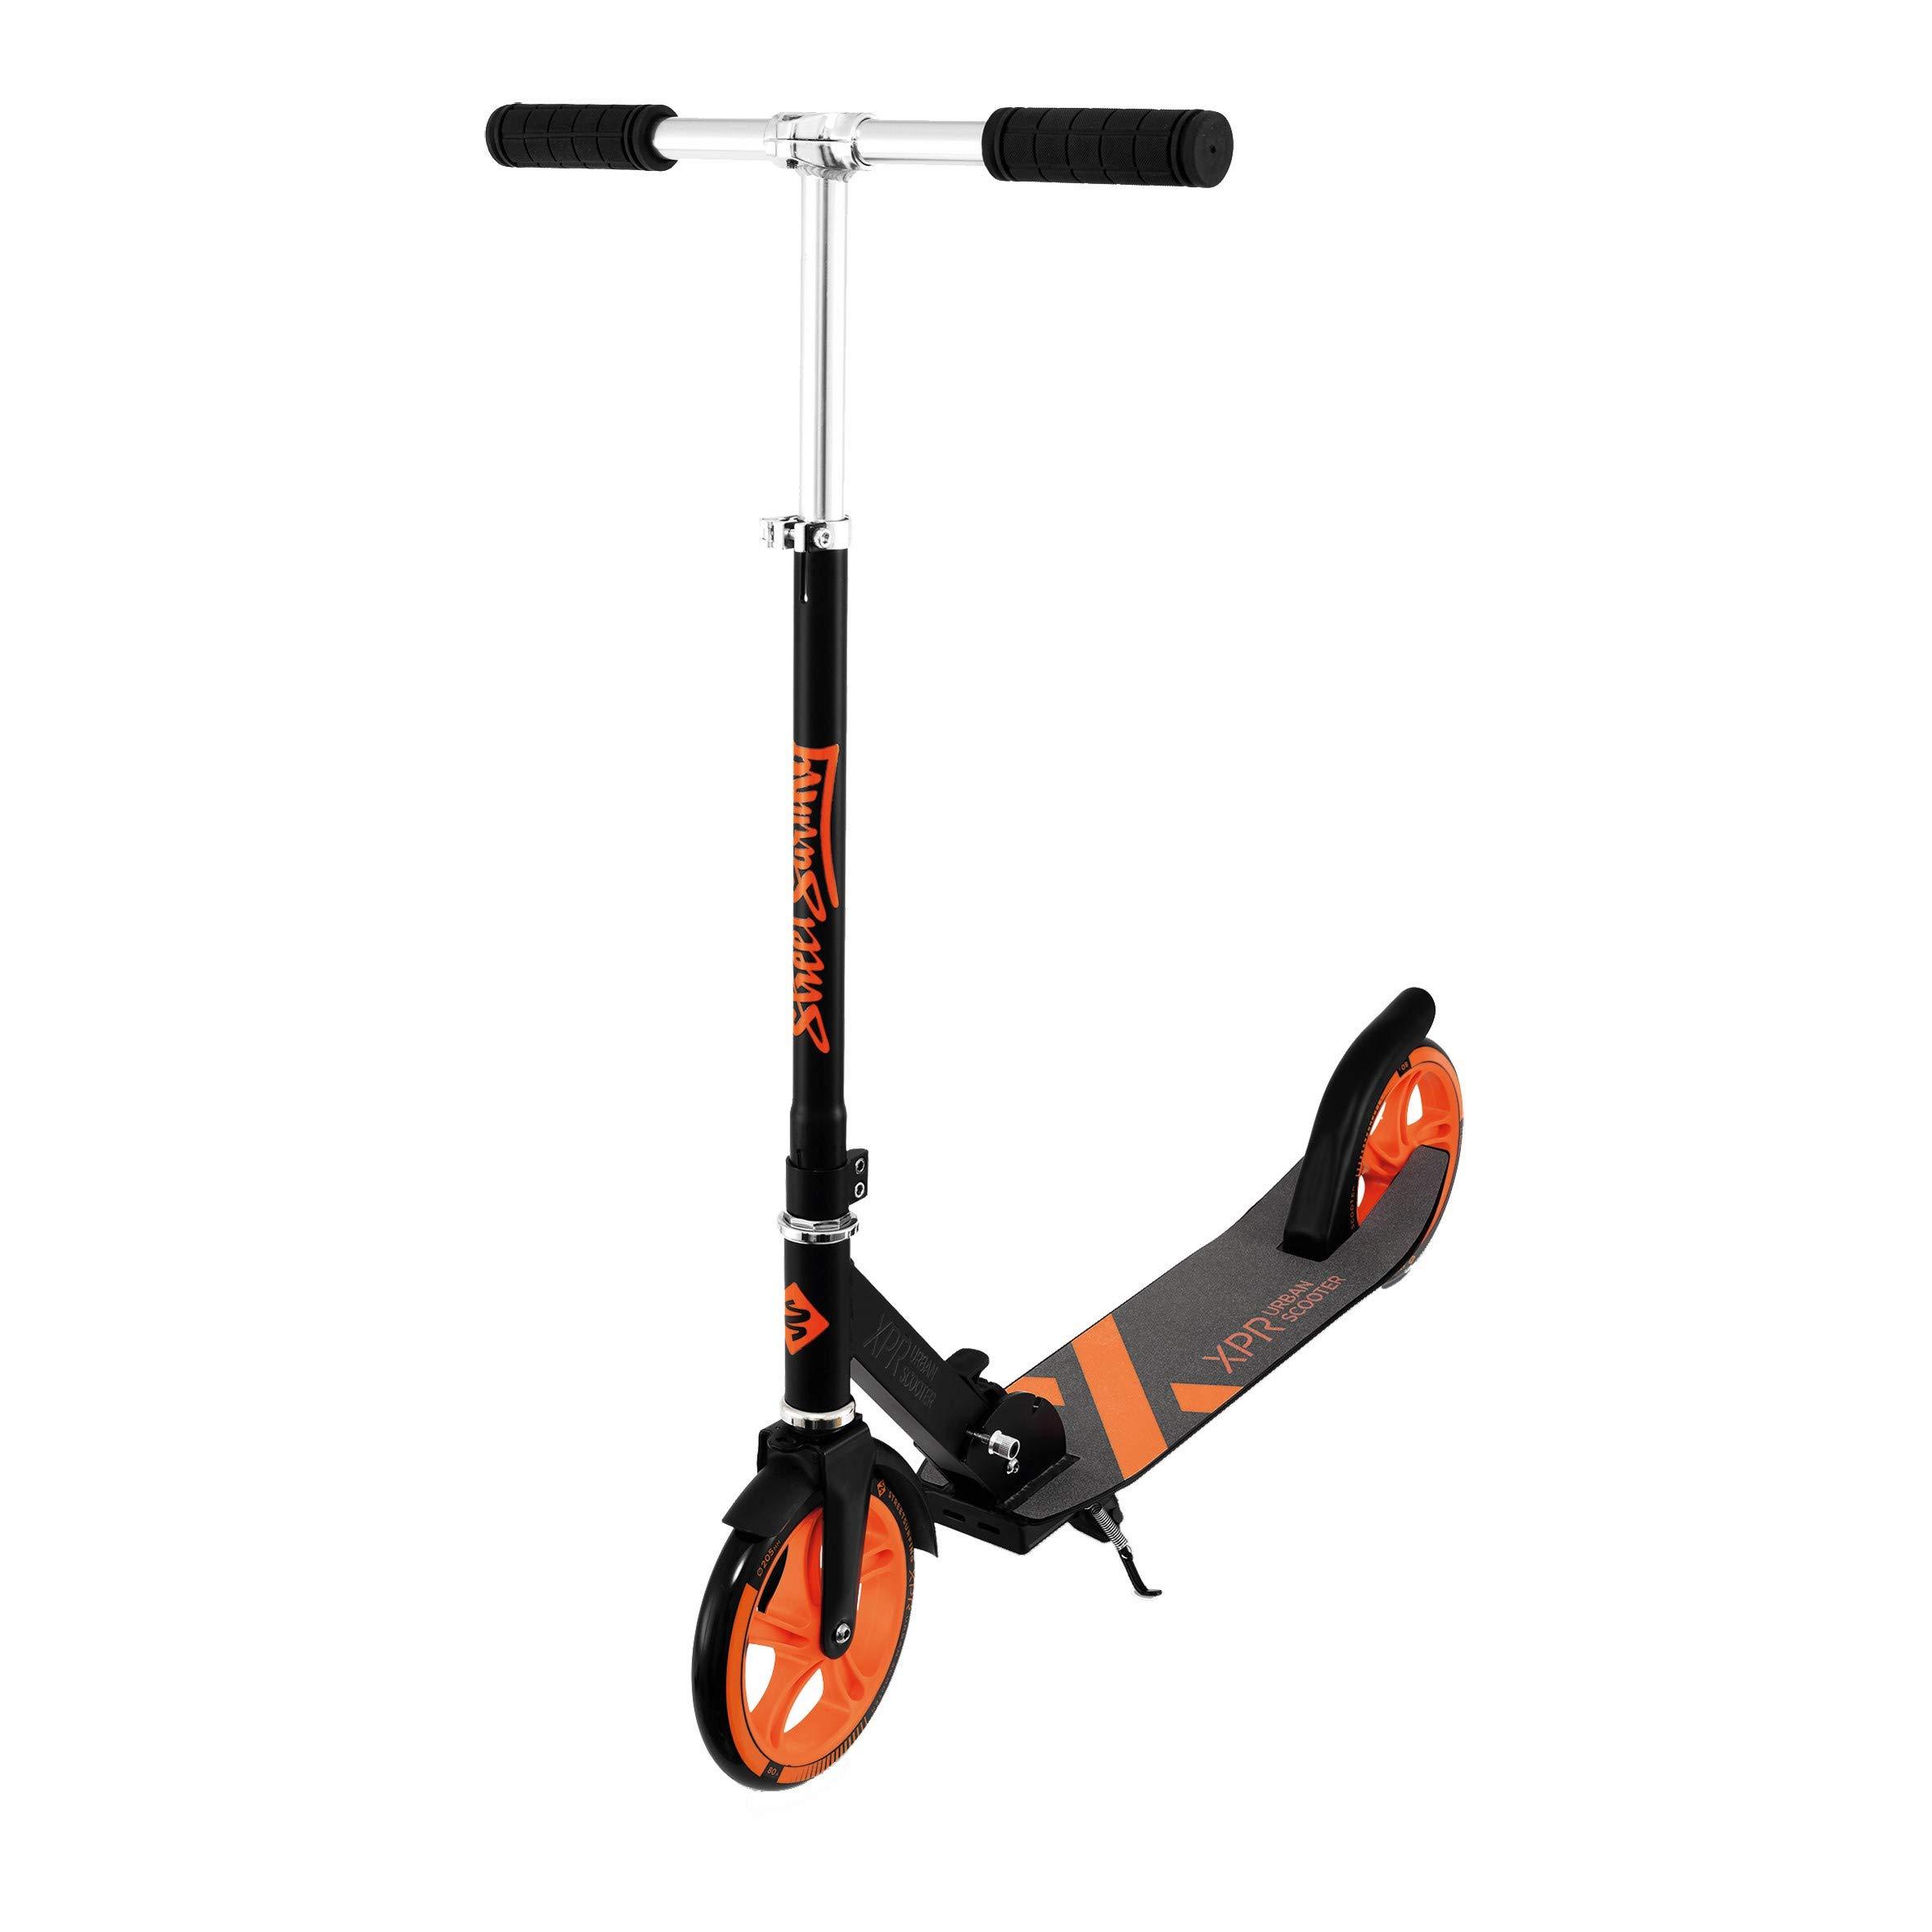 Street Surfing Stunt-Scooter Tretroller Stuntscooter Roller Cityroller Scooter